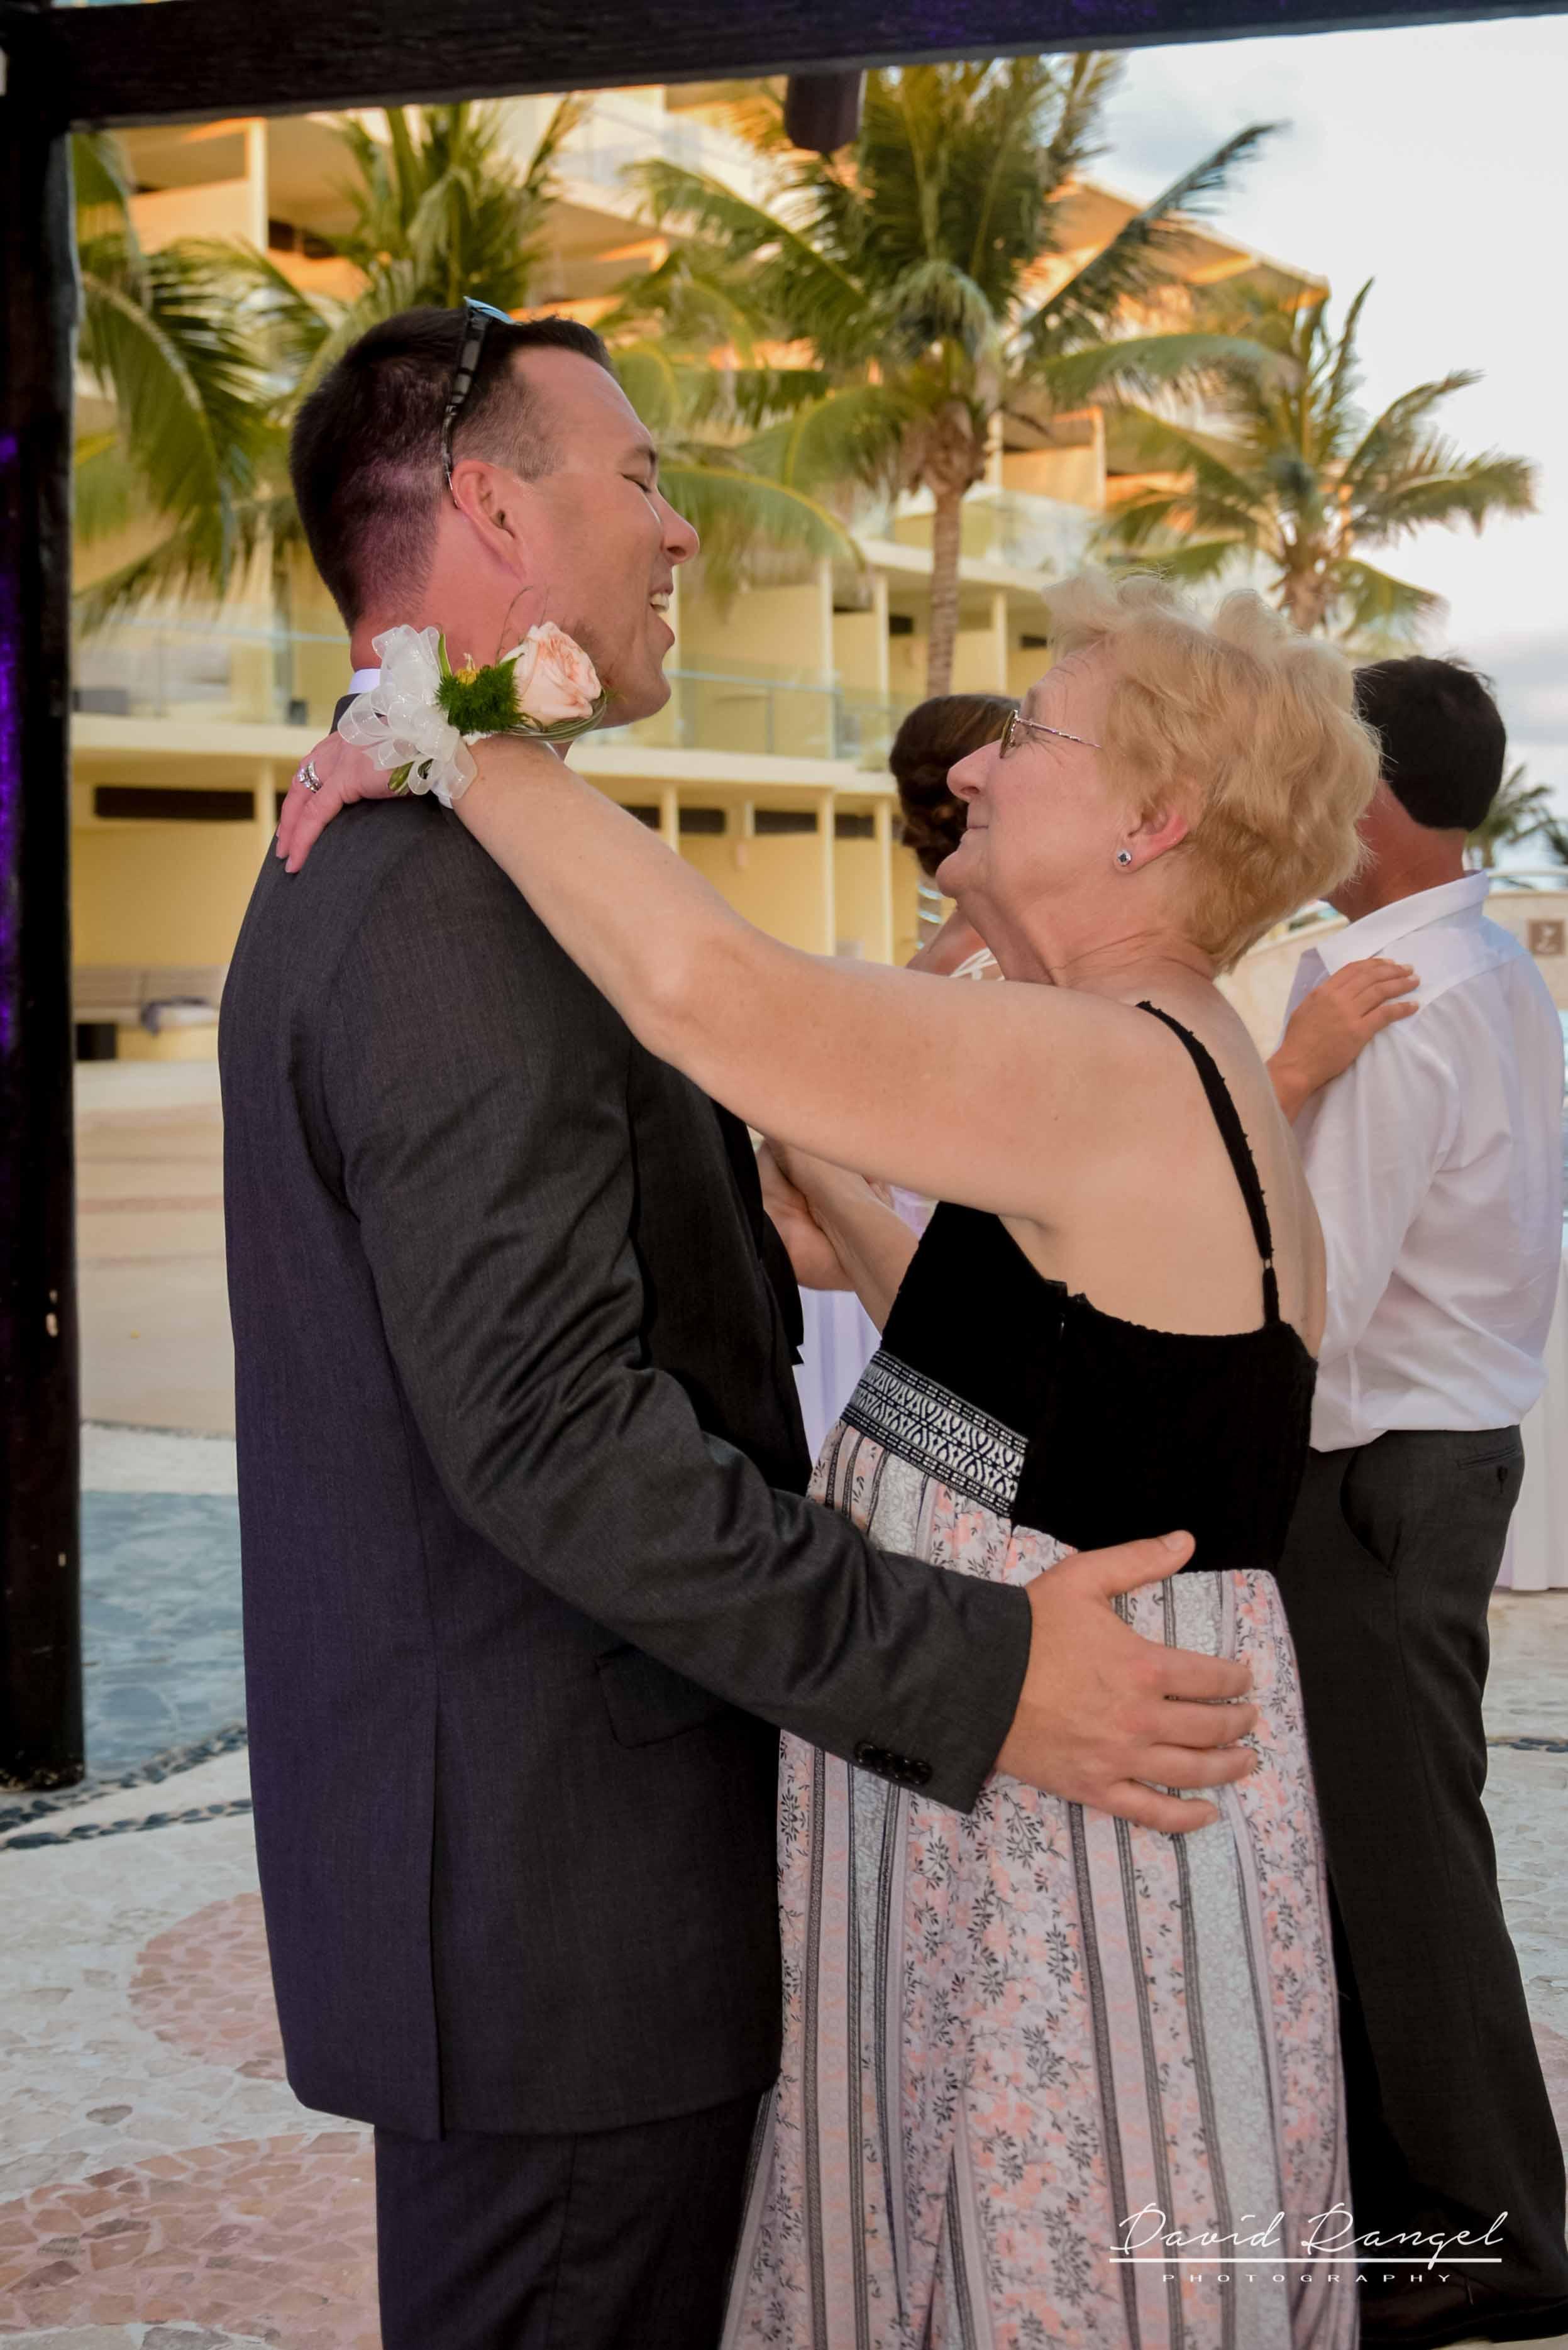 grandma and grandson dance